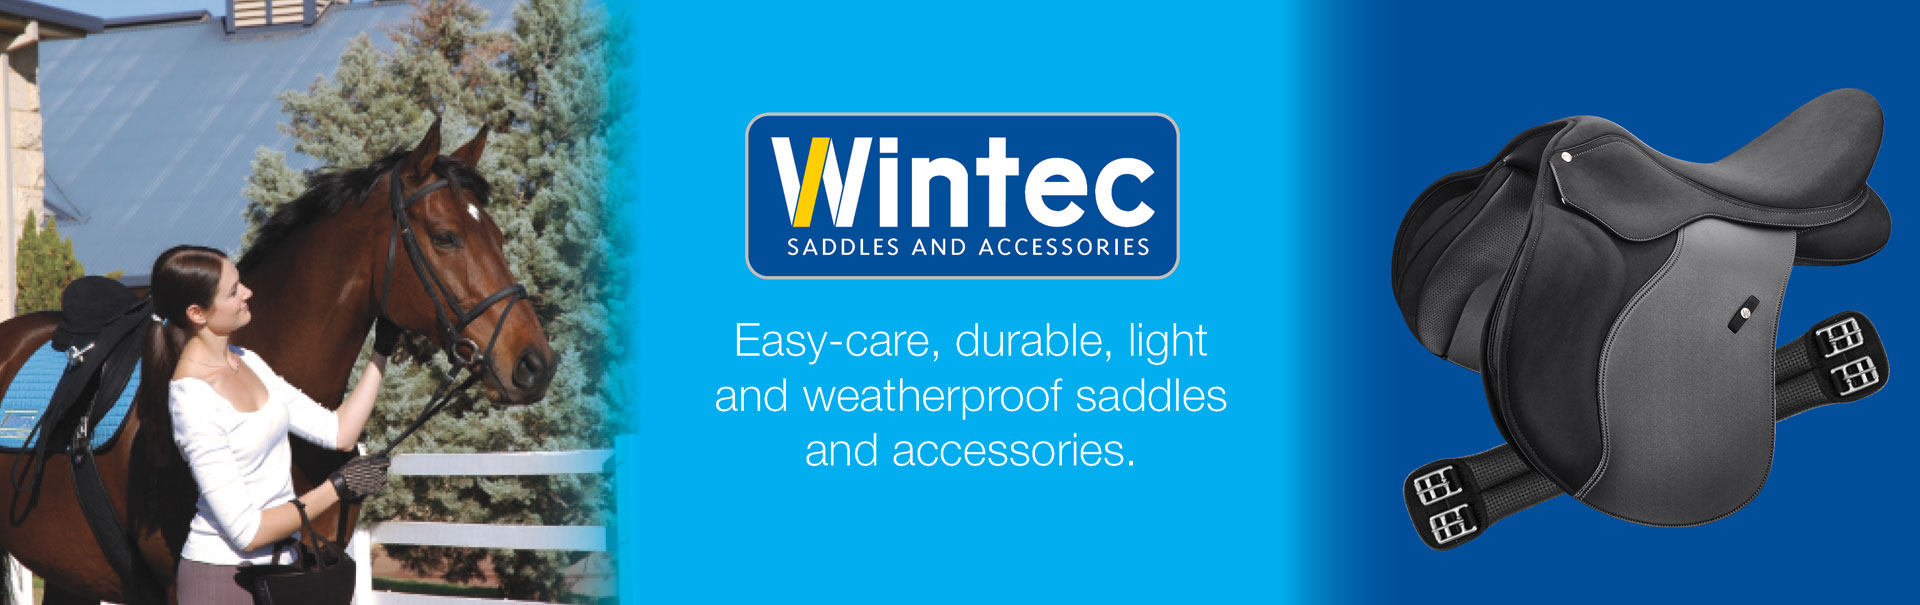 Wintec Saddles